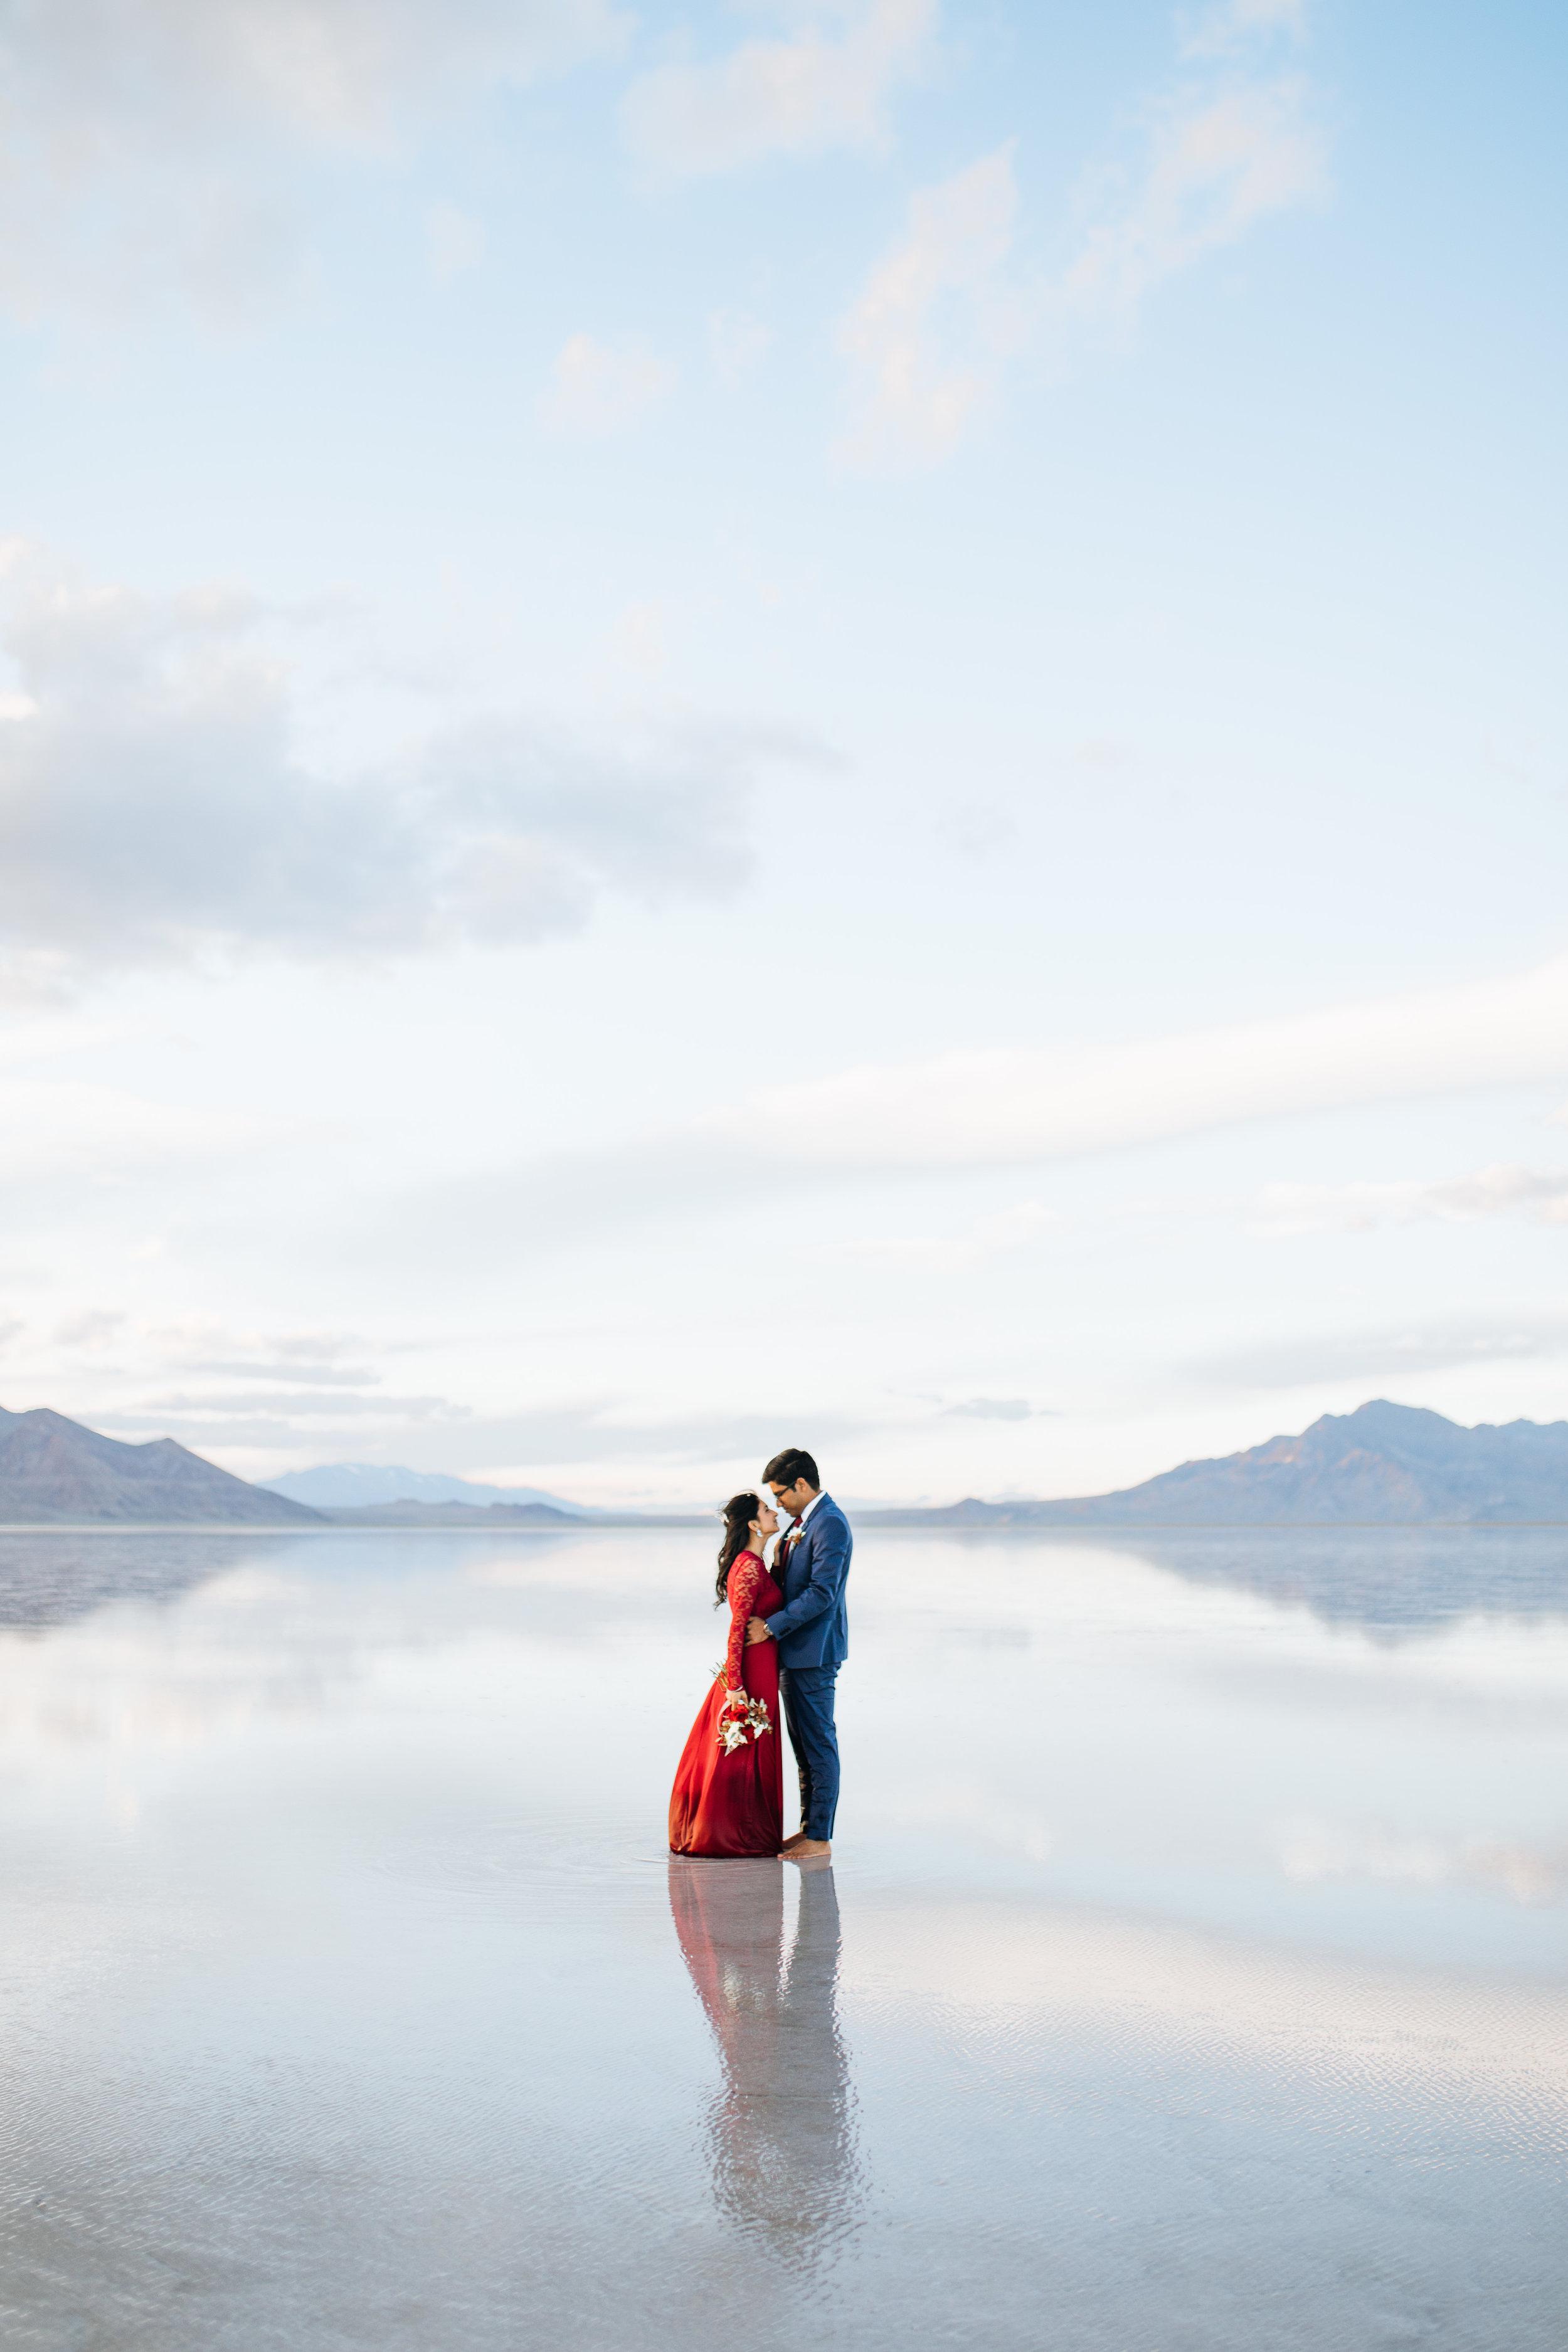 bonneville-salt-flats-engagement-couple-photos-destination-wedding-photography-12.jpg